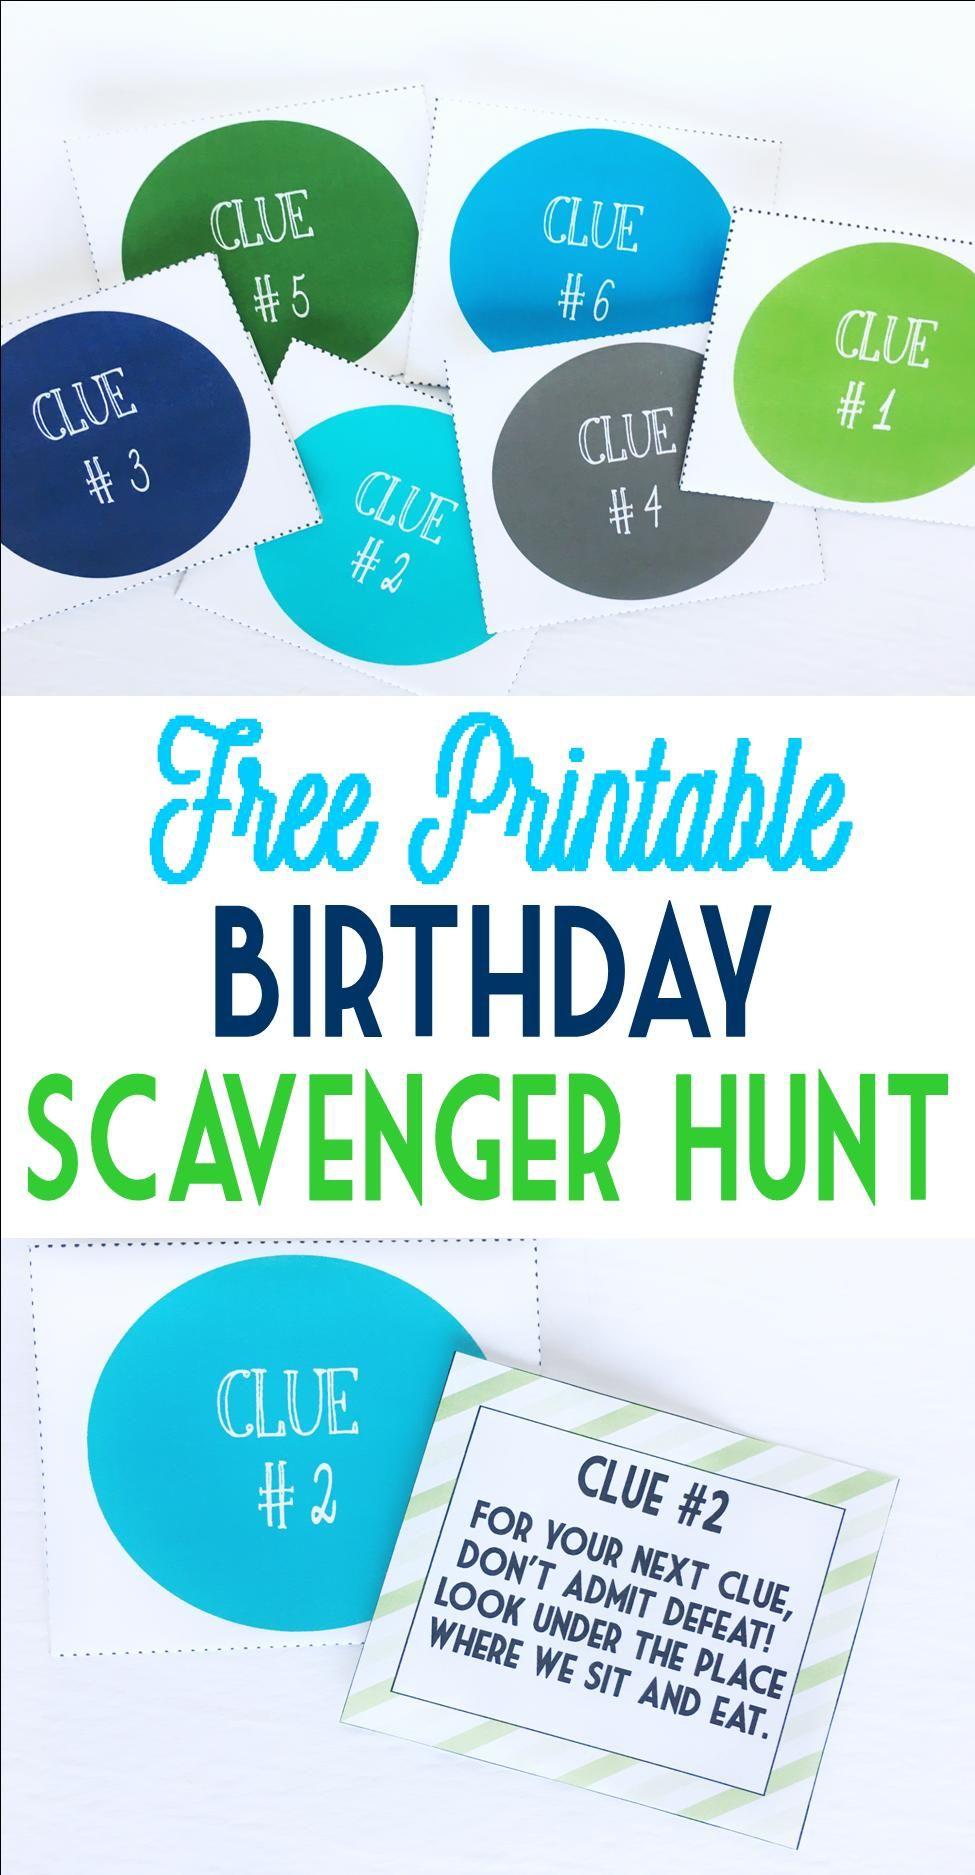 Birthday Scavenger Hunt | Date Ideas | Pinterest | Birthday ...